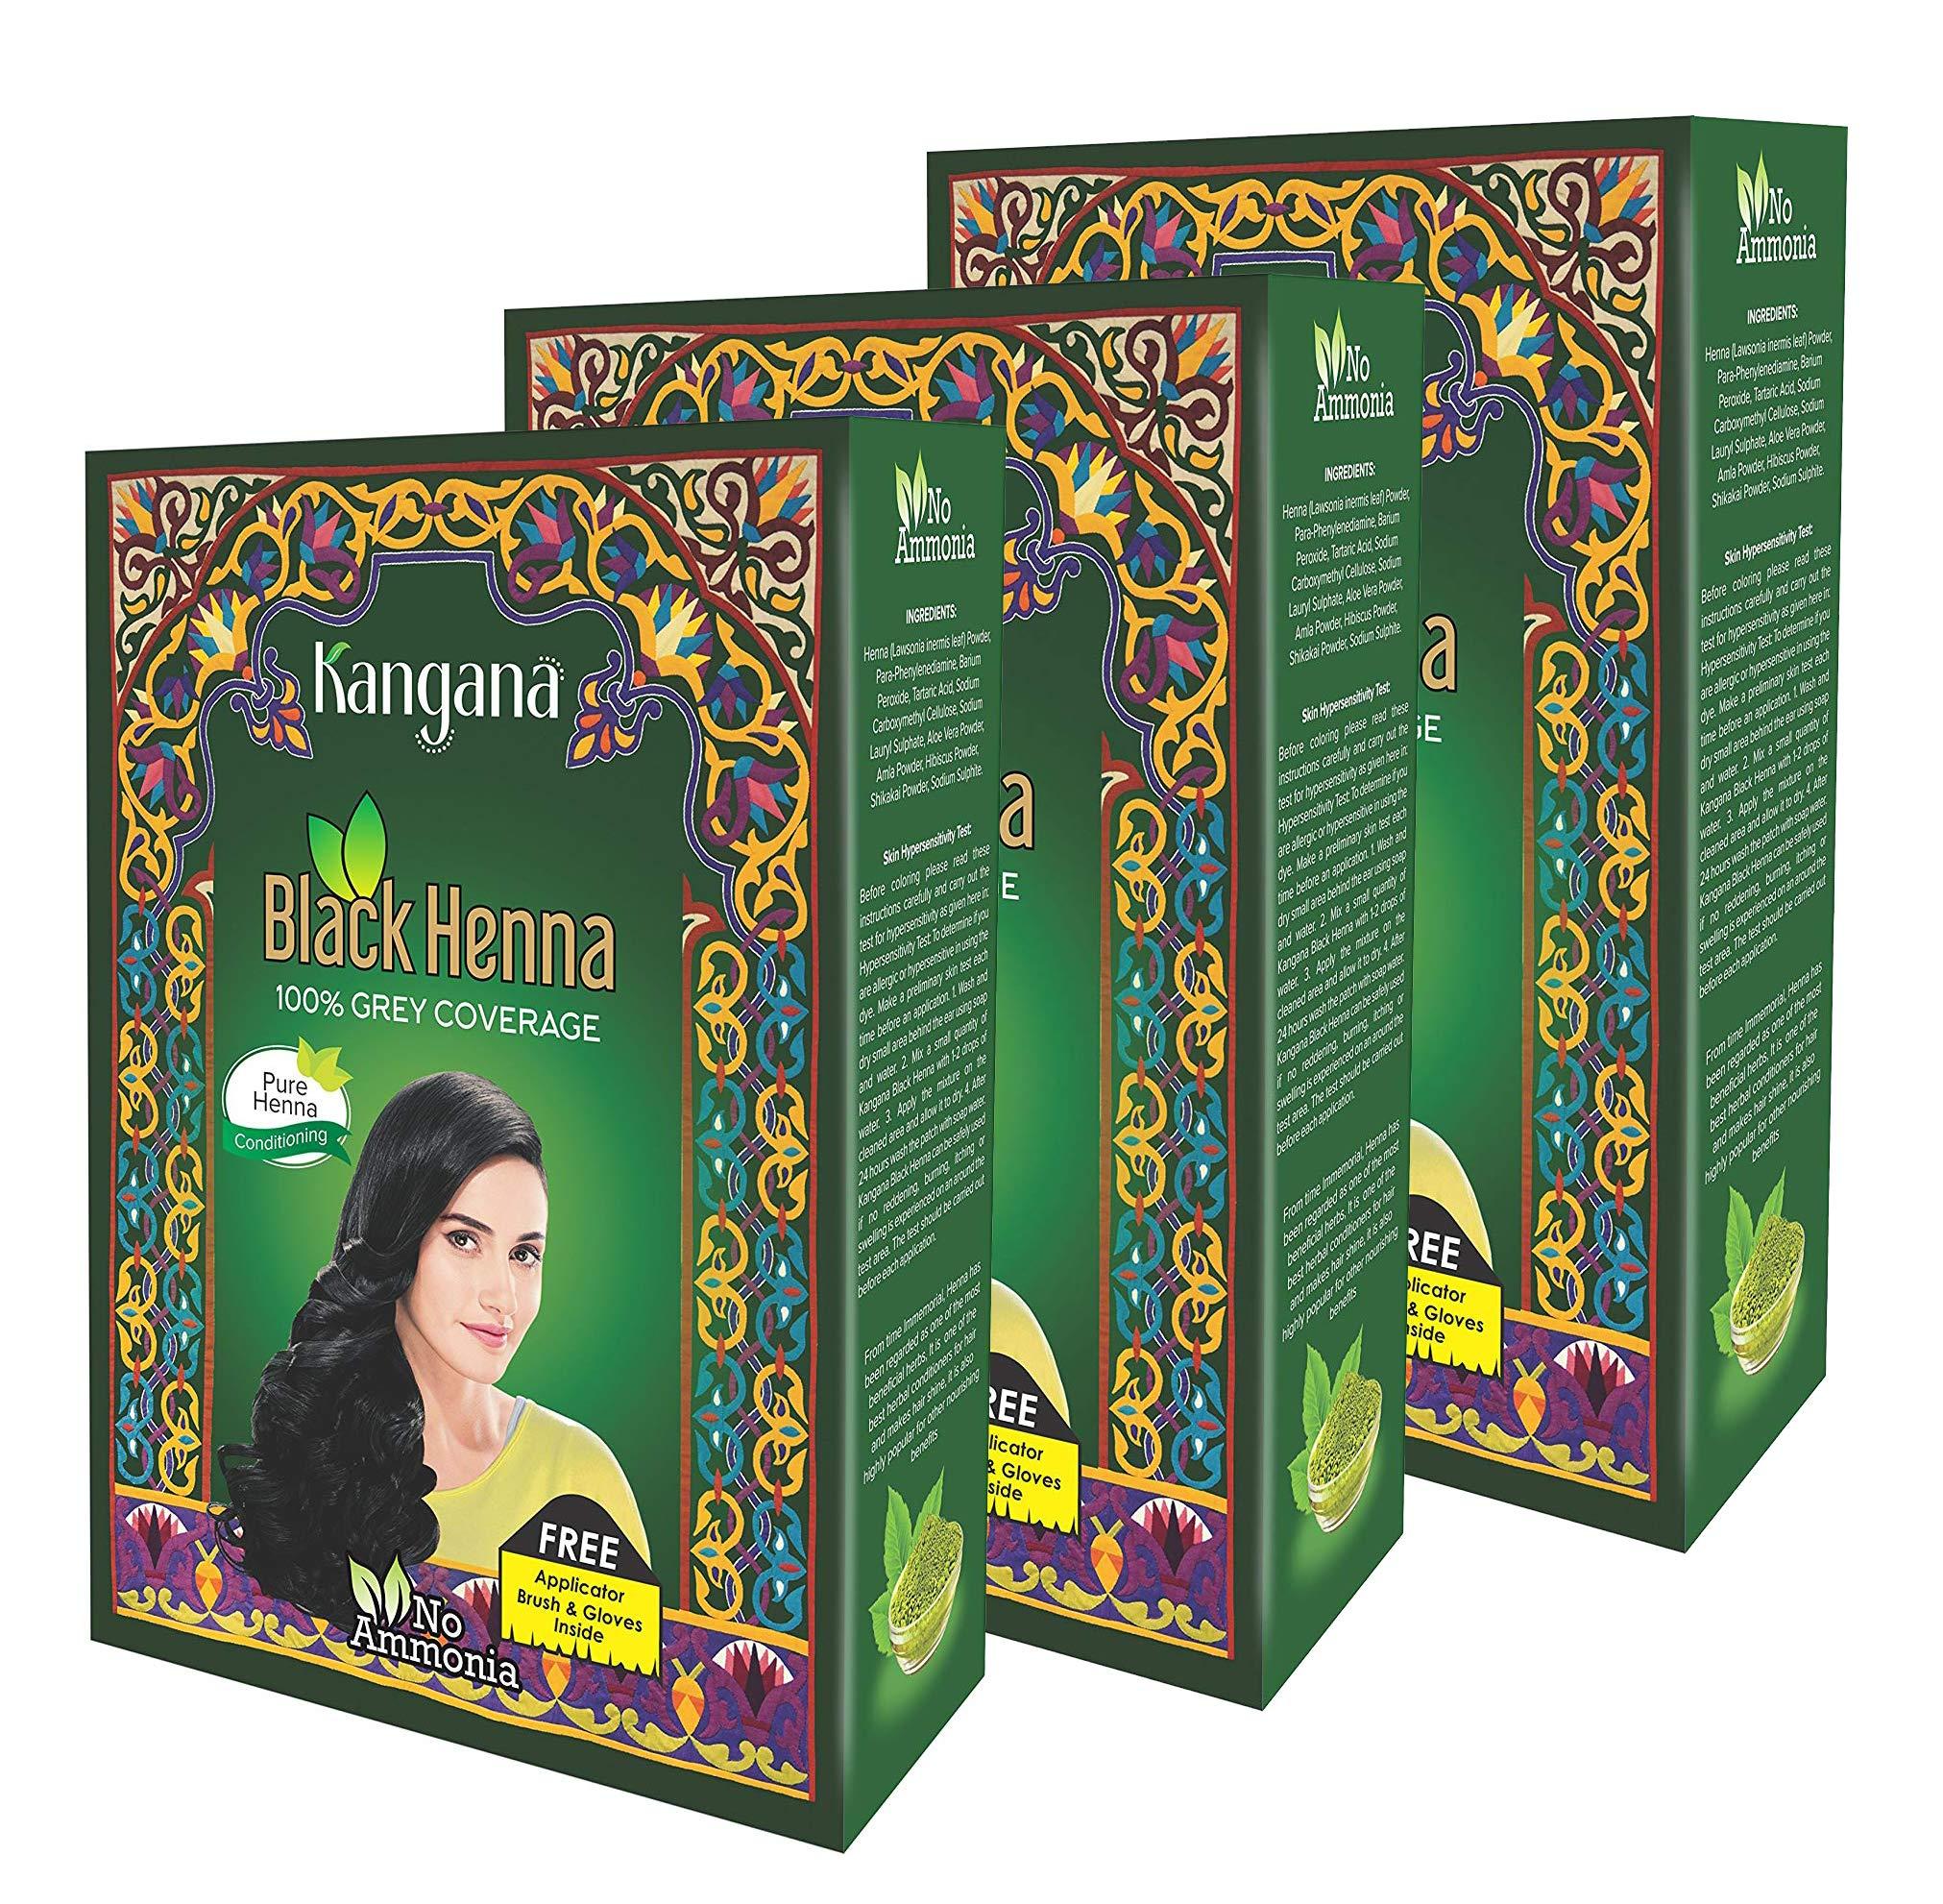 Kangana Black Henna Powder for 100% Grey Coverage - Natural Black Henna Powder for Hair Dye/Color- 6 Pouches Each - Total 180g (6.34 Oz)- Pack of 3 by Kangana